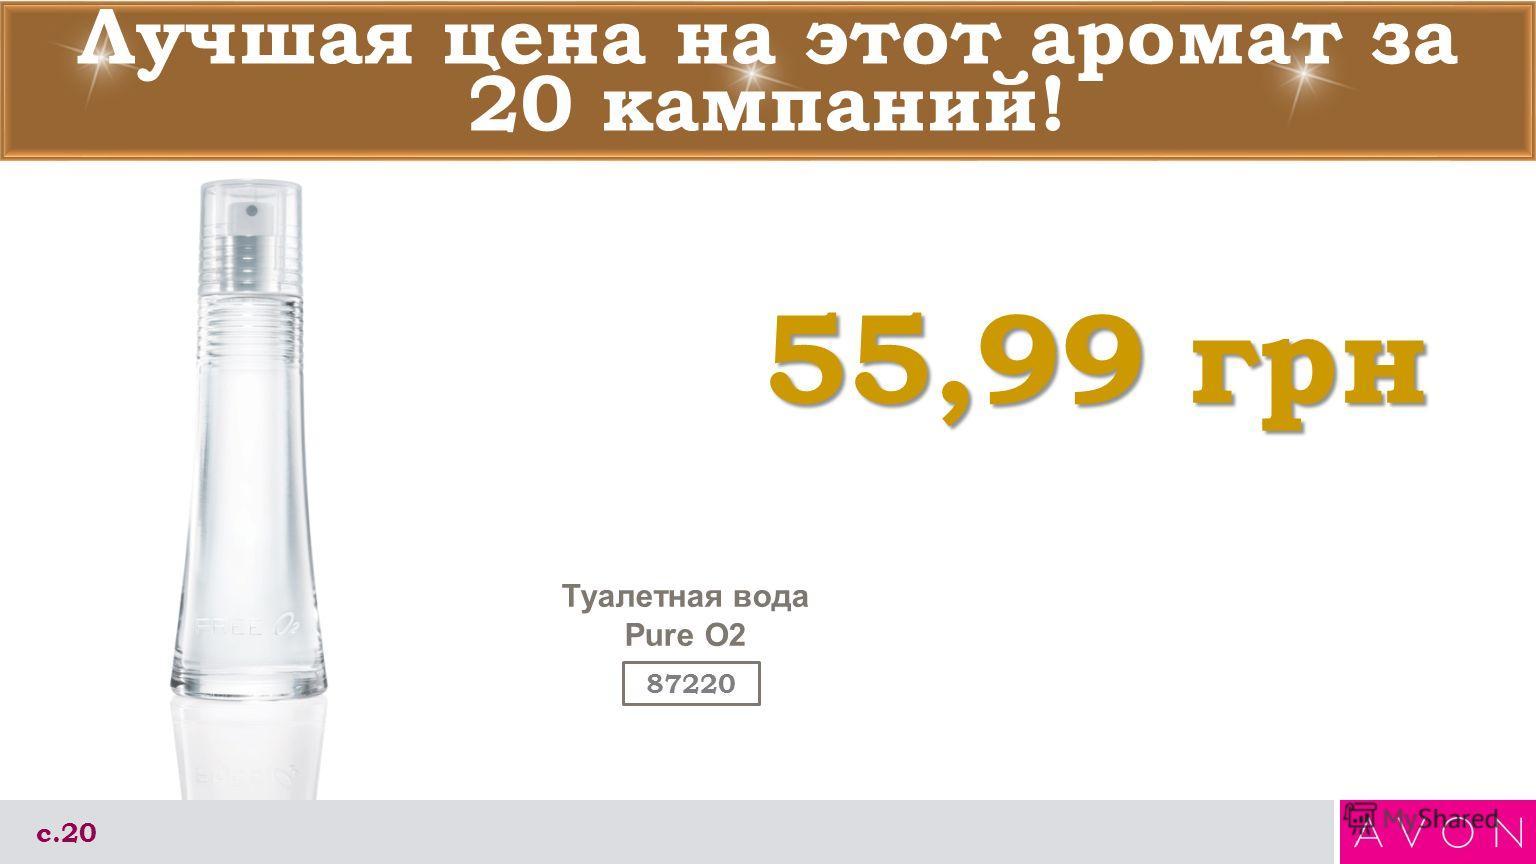 Лучшая цена на этот аромат за 20 кампаний! с.20 Туалетная вода Pure O2 55,99грн 55,99 грн 87220